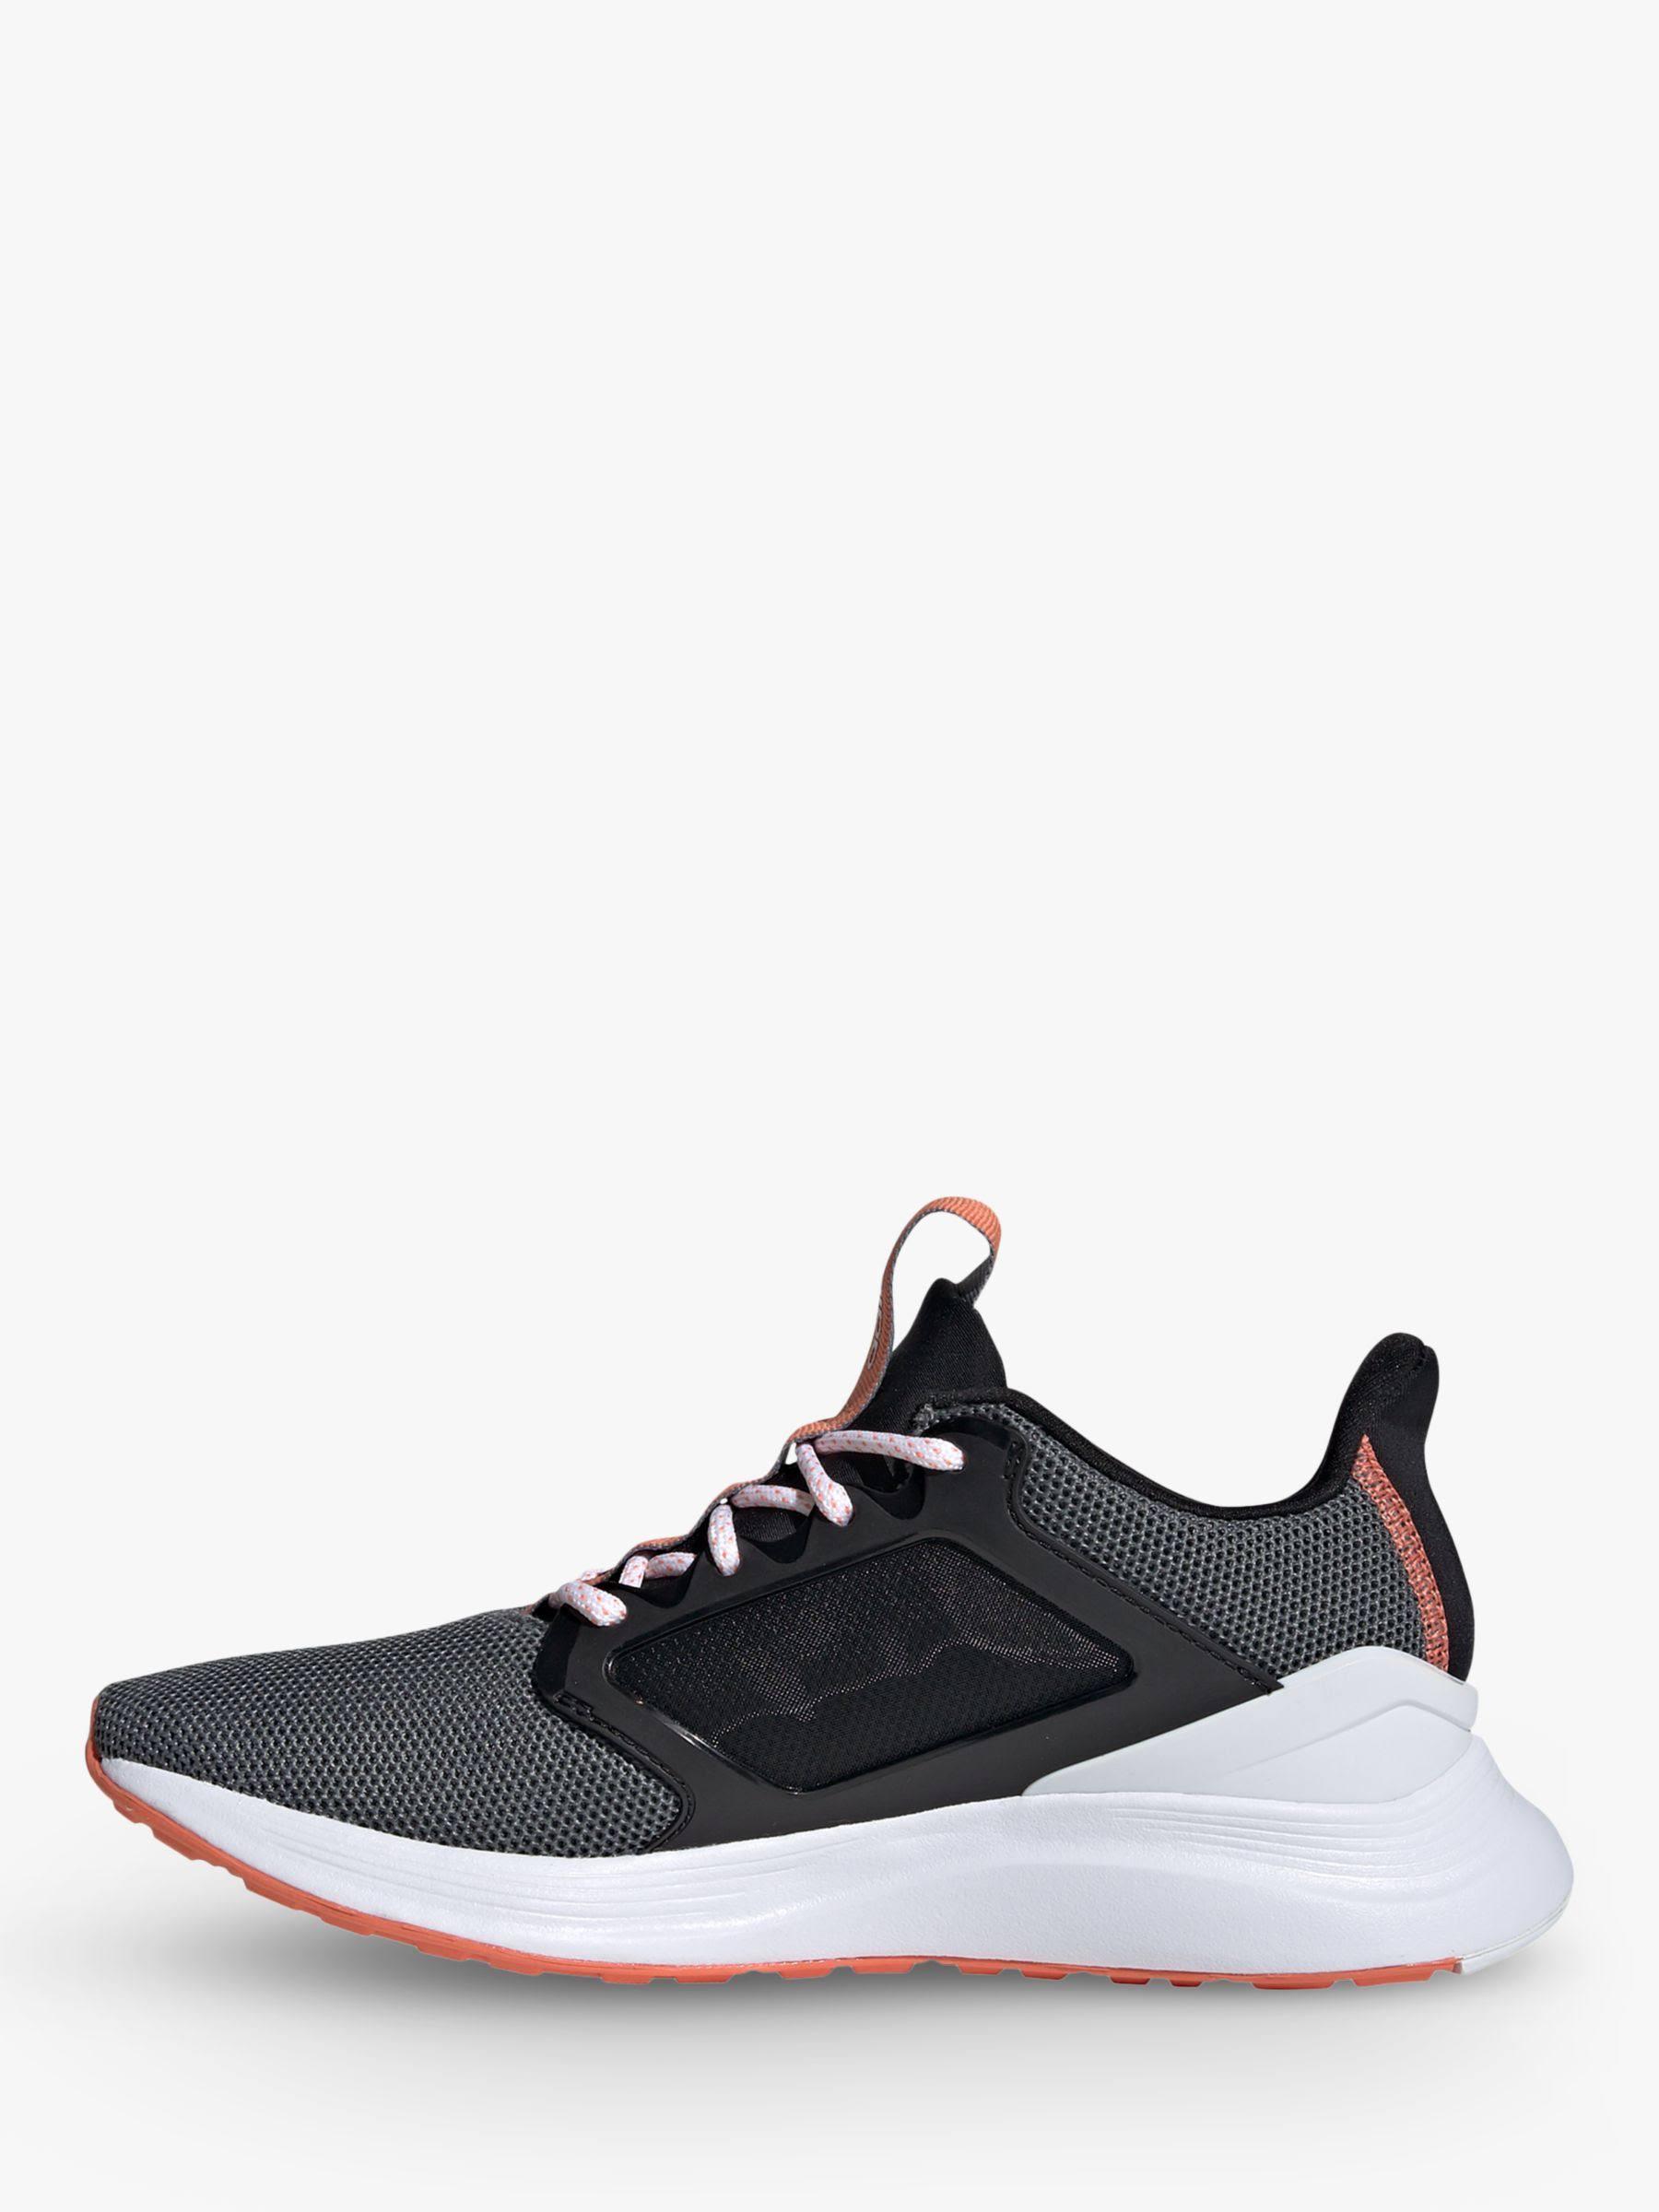 Adidas Energyfalcon x Shoes Running - Womens - Black